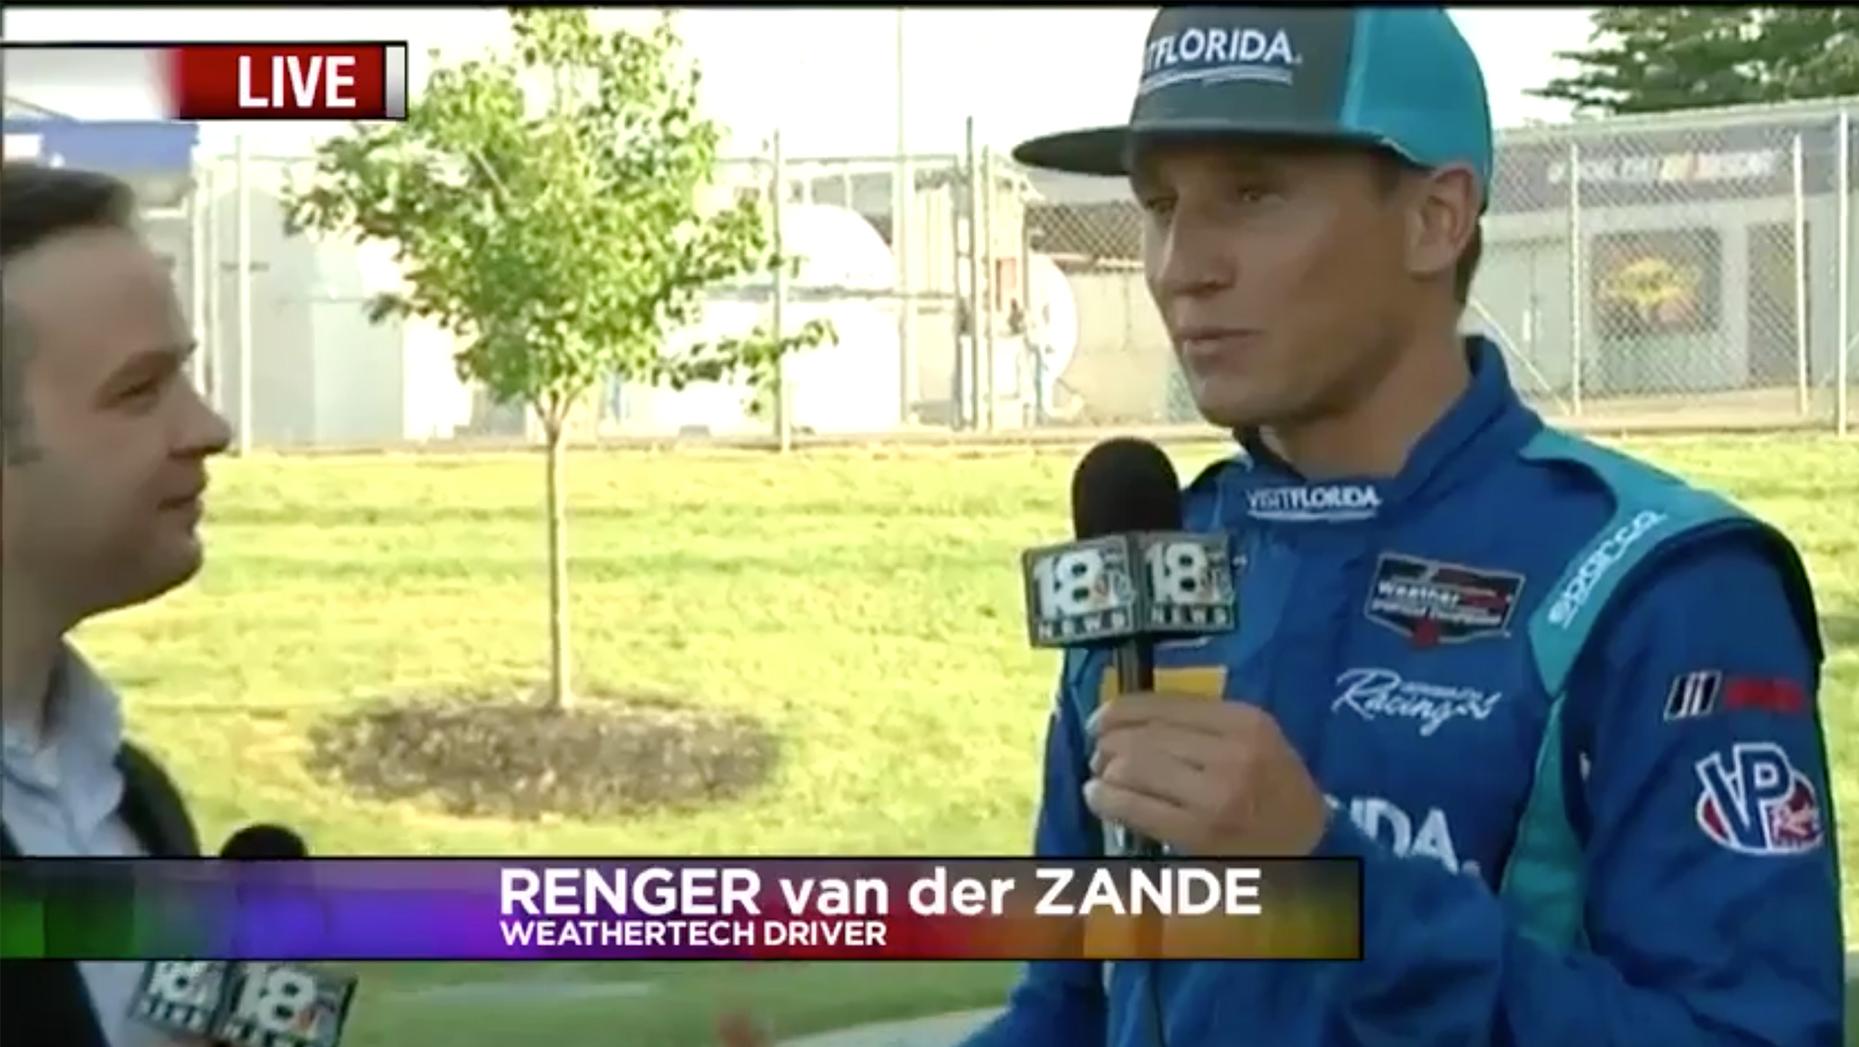 18Sports LIVE with IMSA Driver Renger van der Zande